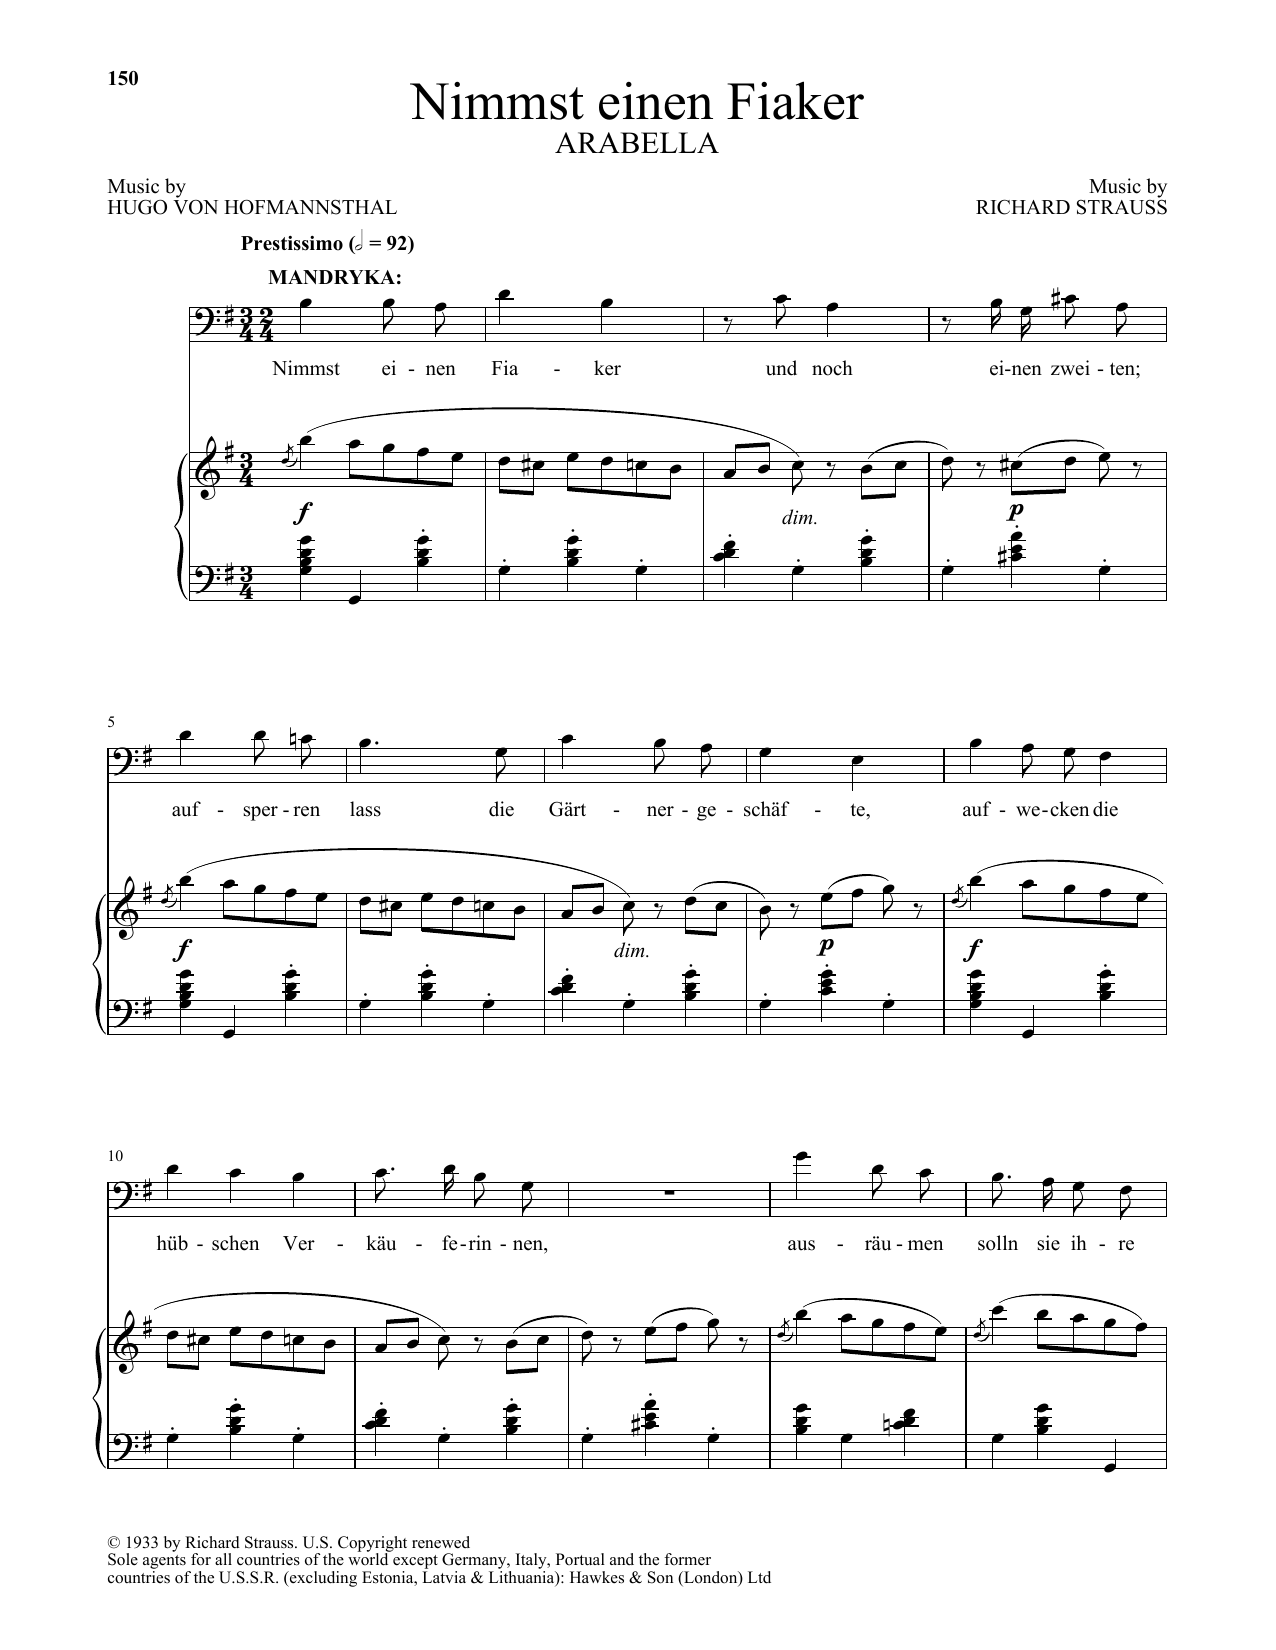 Richard Strauss Nimmst einen Fiaker (from Arabella) sheet music notes and chords. Download Printable PDF.